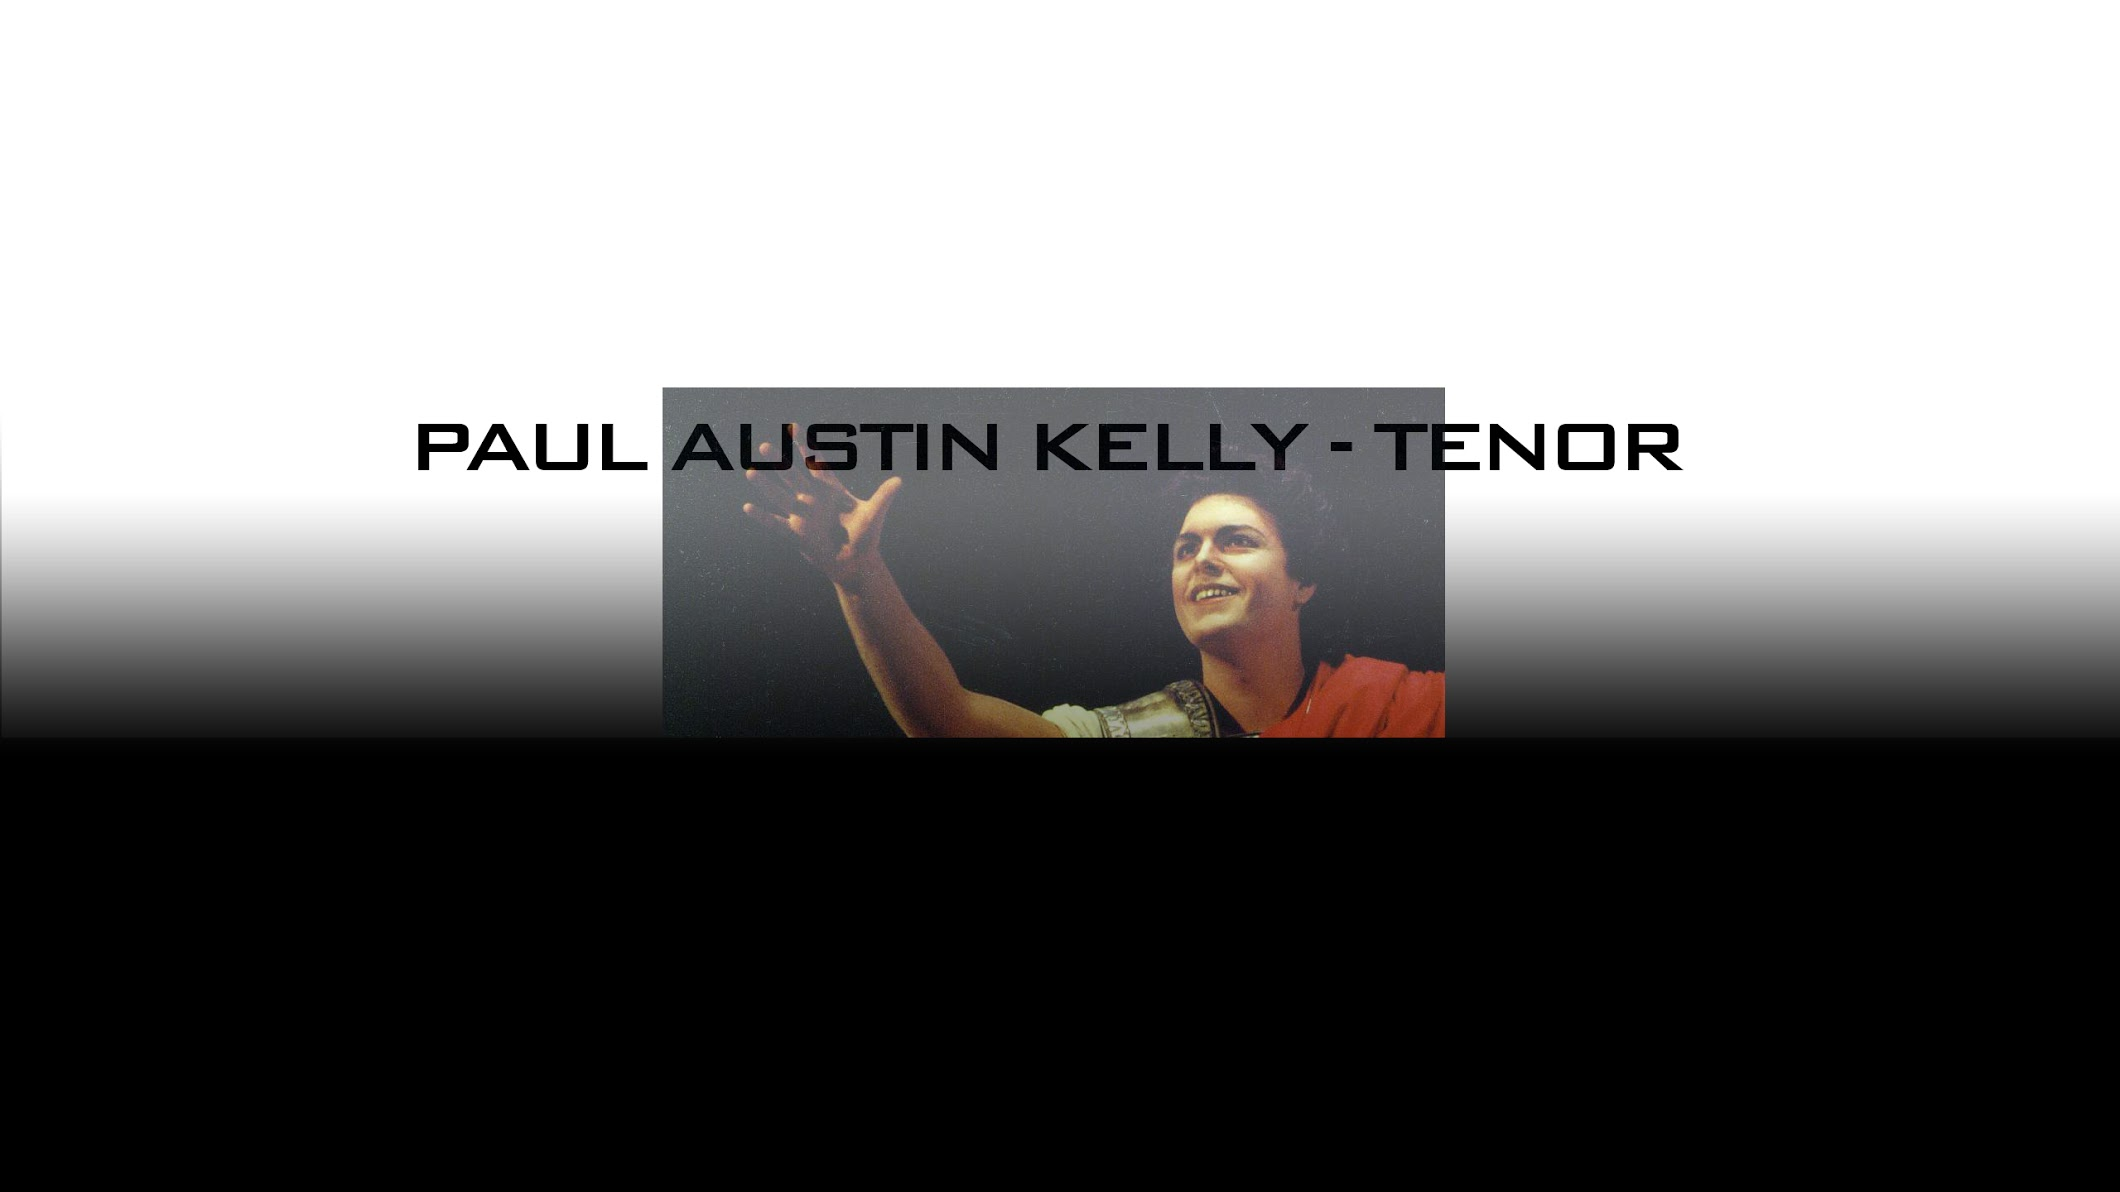 Paul Austin Kelly